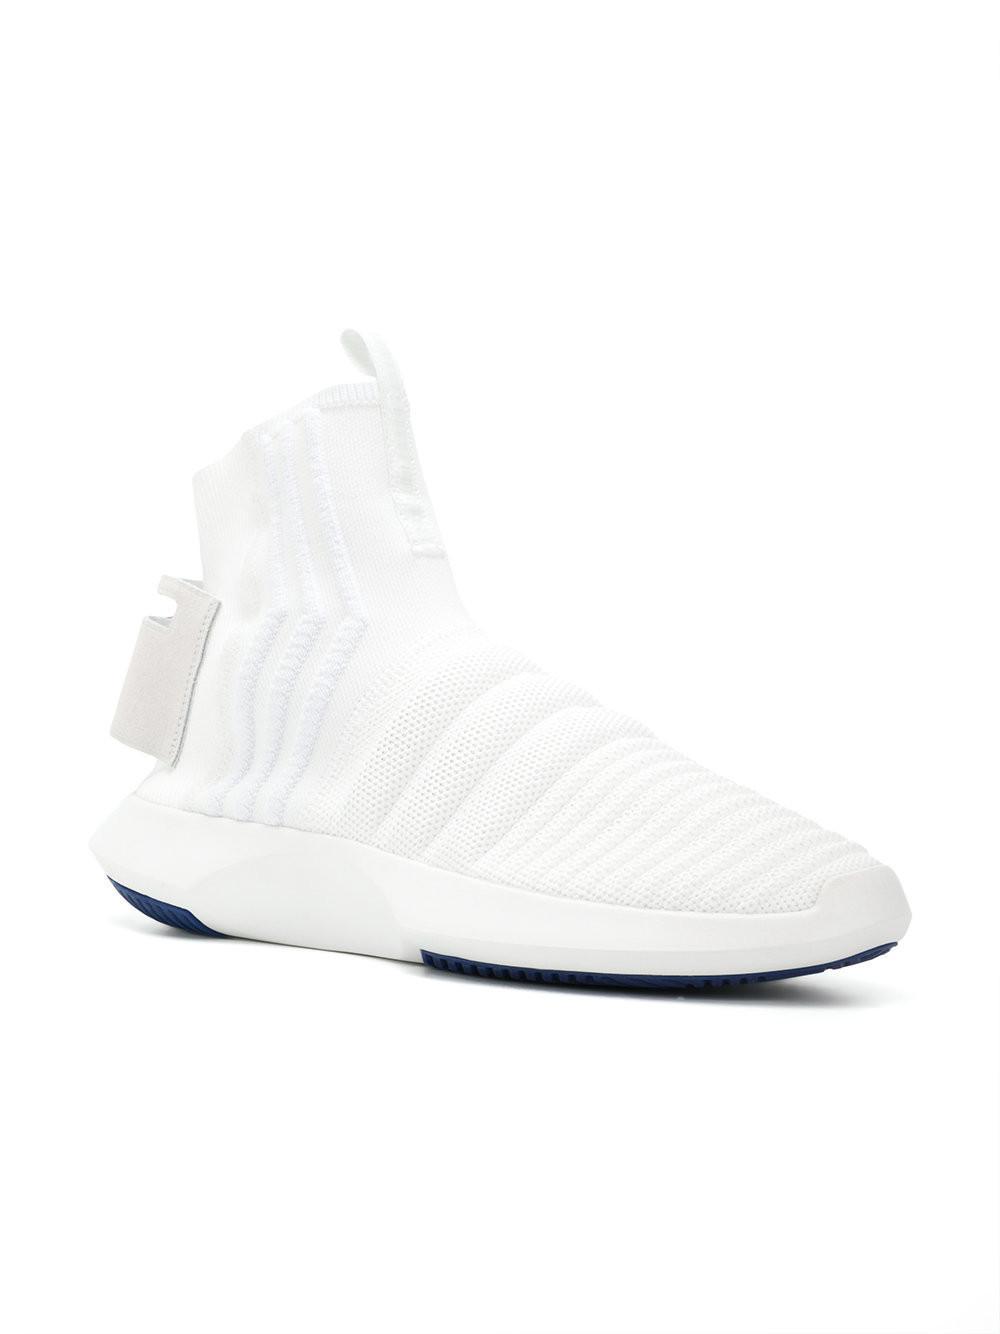 buy popular 1a178 9312d Adidas Originals - White Crazy 1 Sock Adv Primeknit Sneakers - Lyst. View  fullscreen